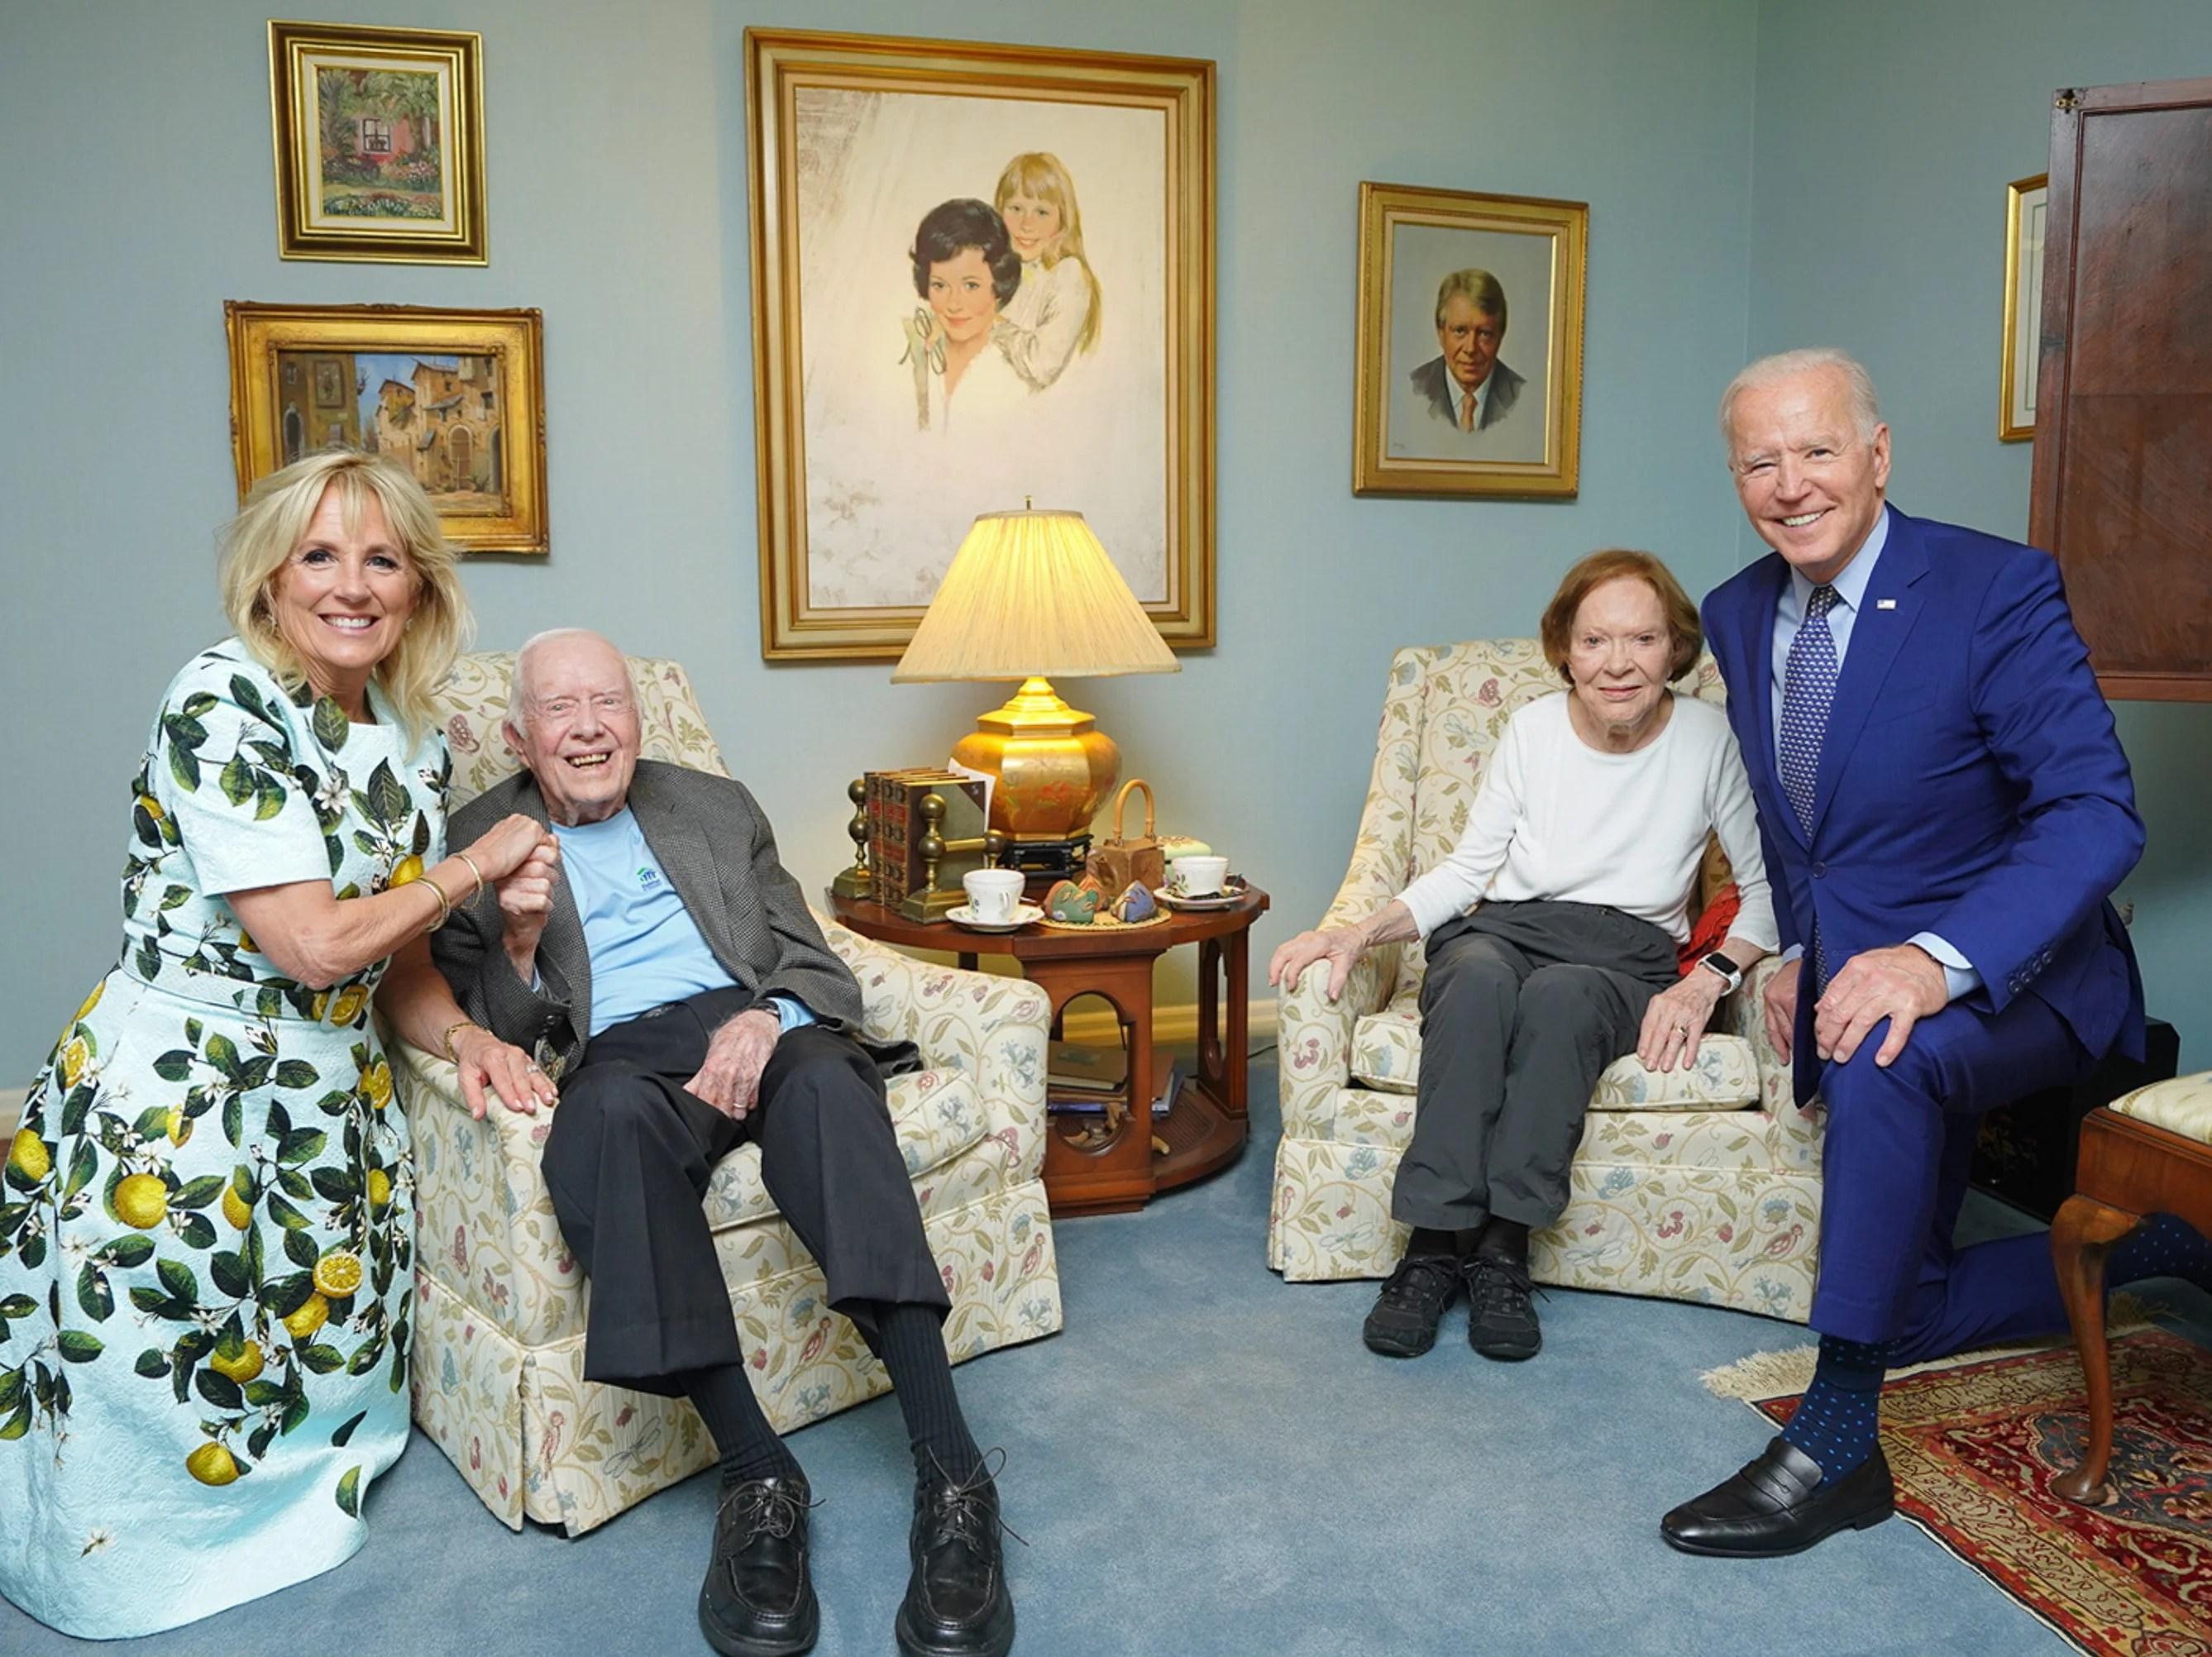 Confusing photo of Bidens meeting Carters baffles social media